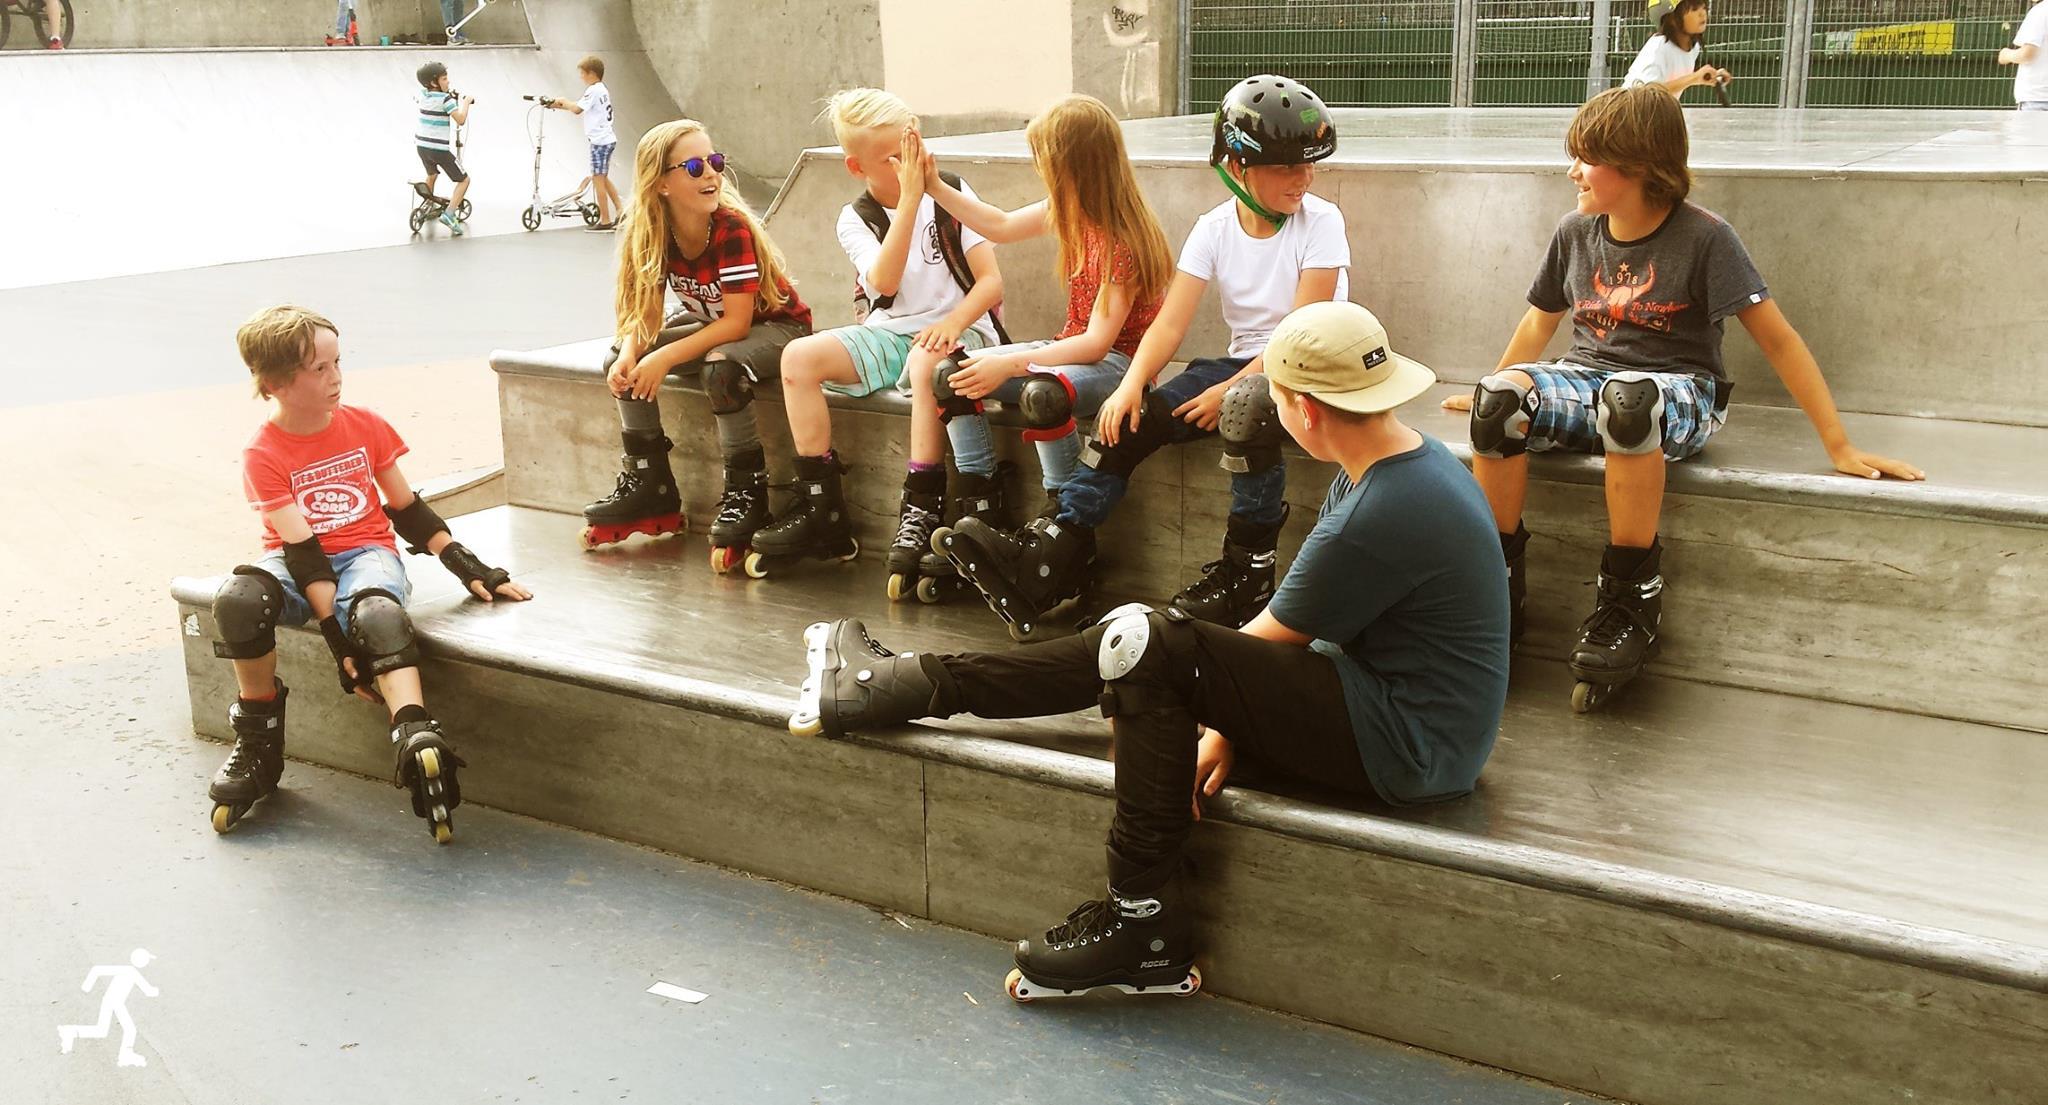 Skateles events